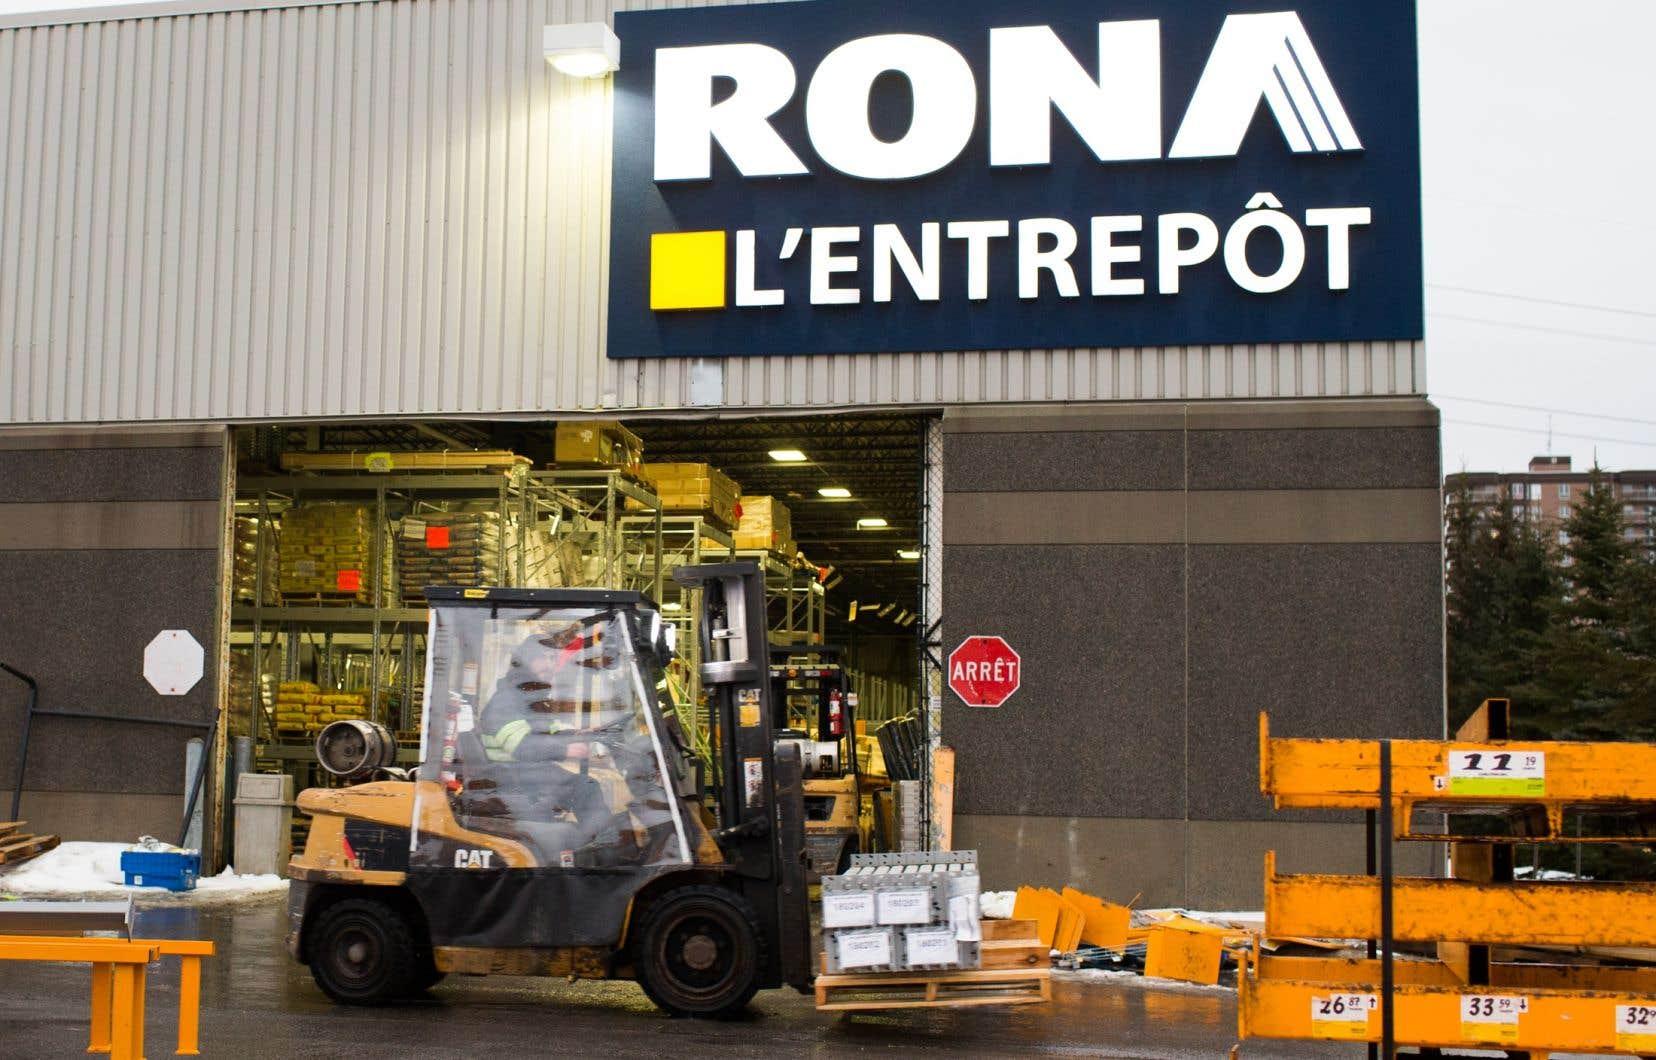 Neuf magasins Rona du Québec sont ciblés.